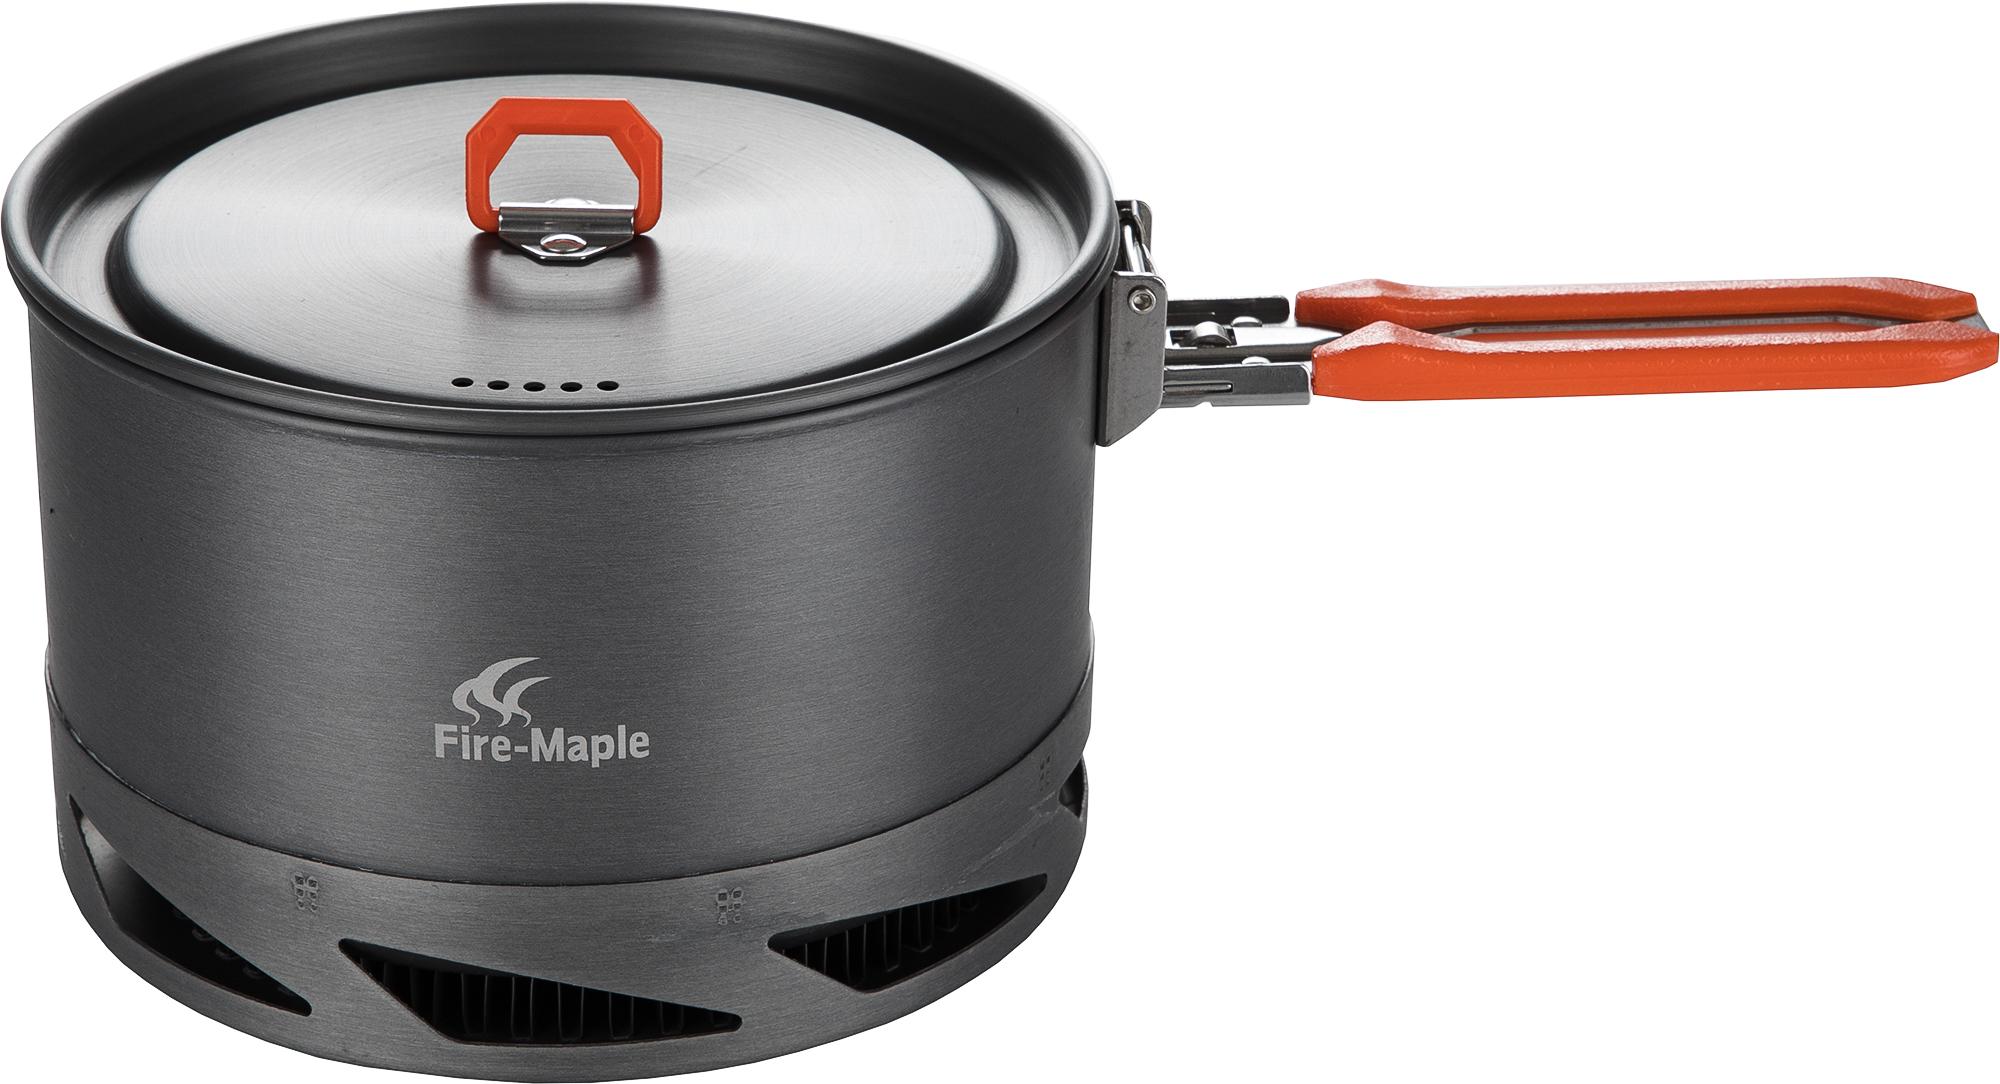 Fire-Maple Котел аннодированный Fire-Maple FEAST K2 цены